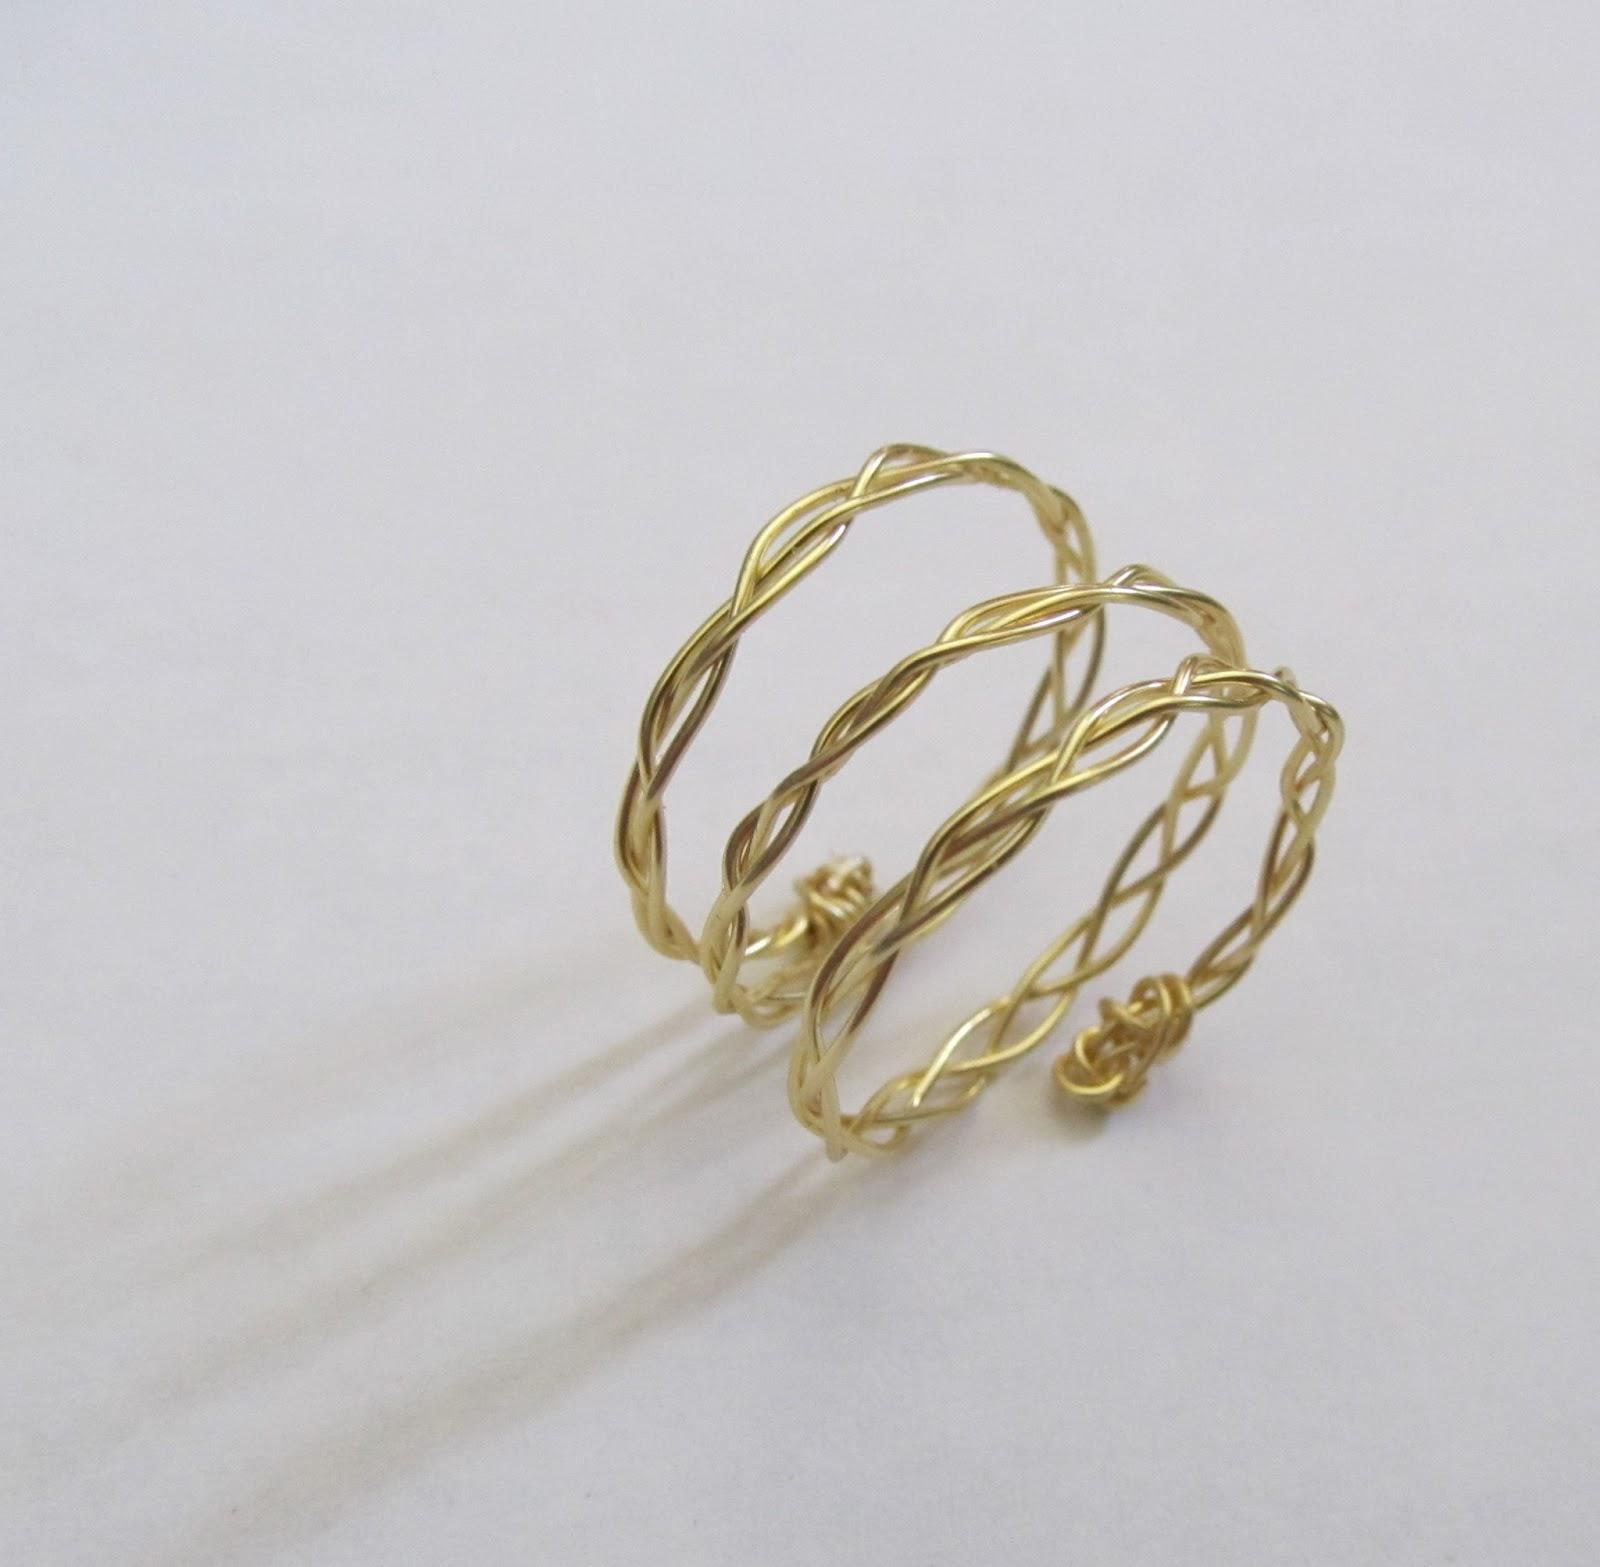 Wrap Around Ring Jewelry